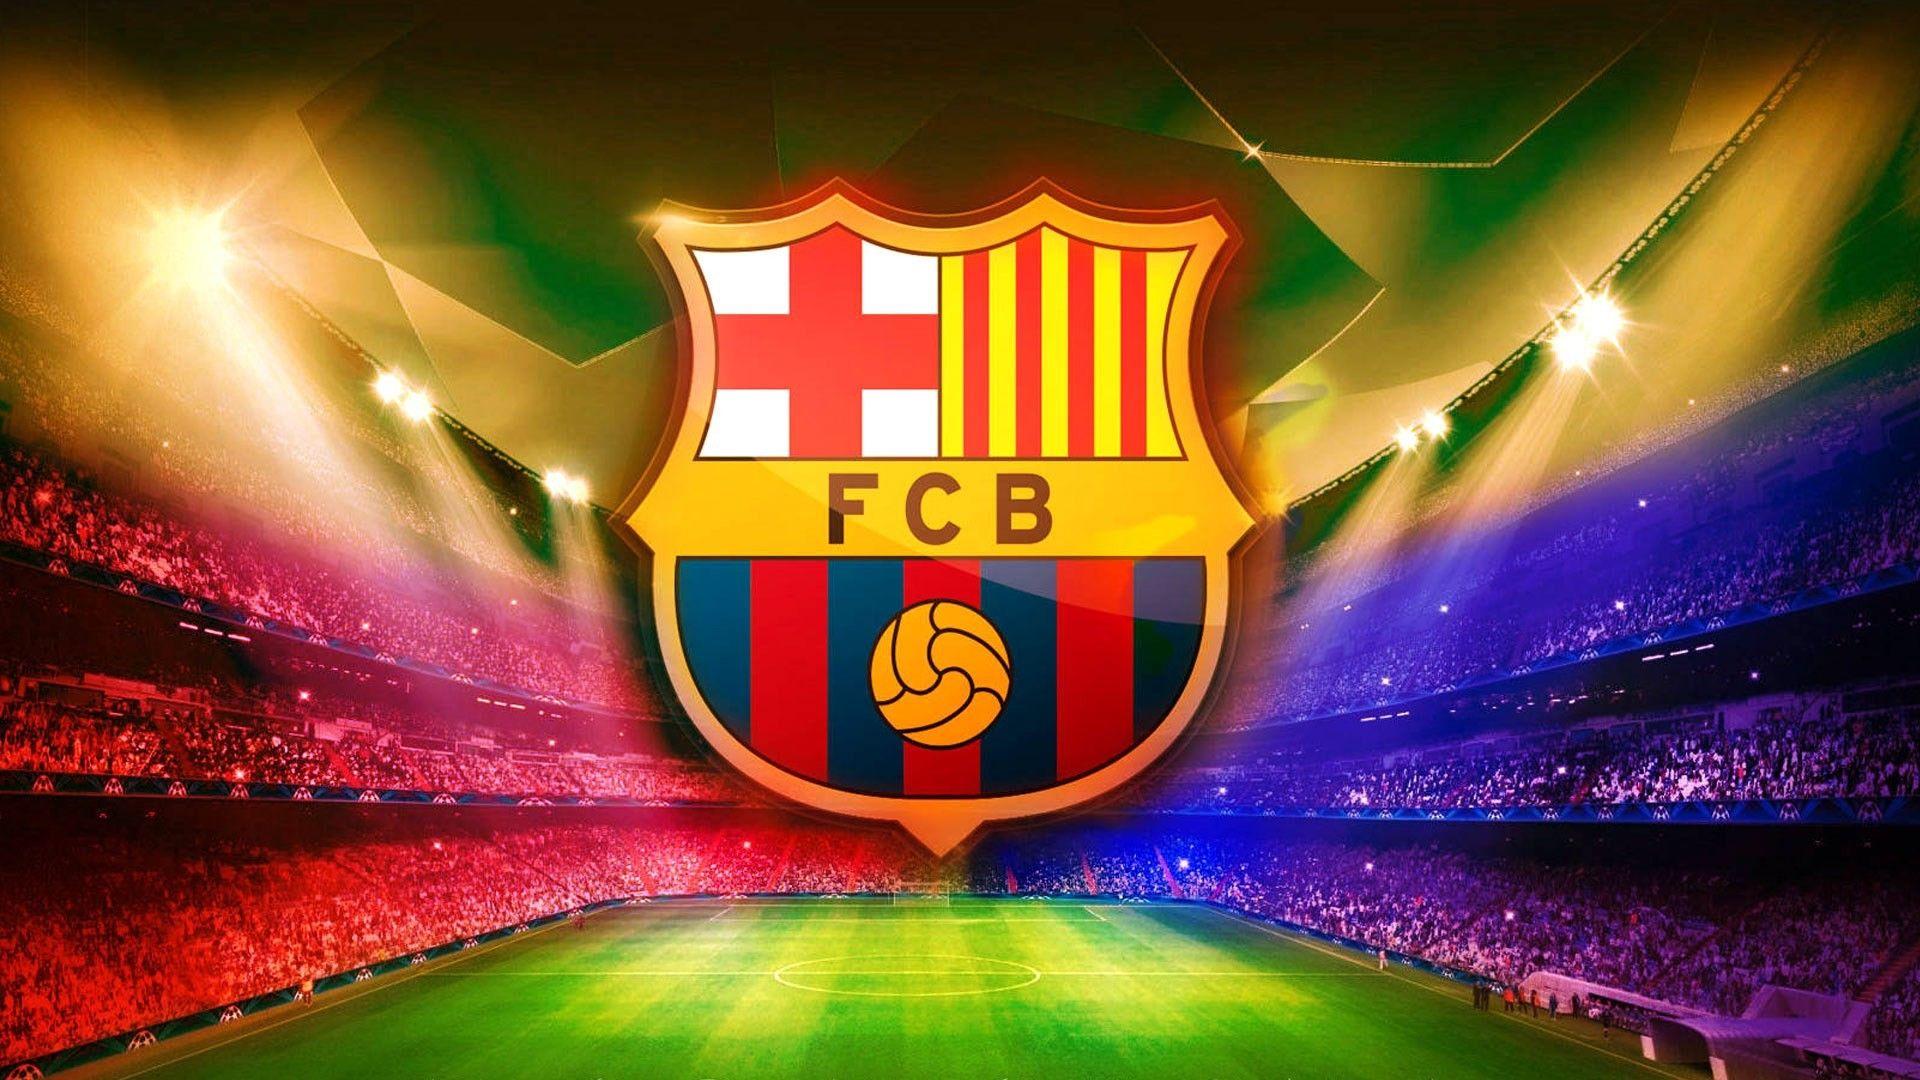 fc barcelona wallpaper iphone